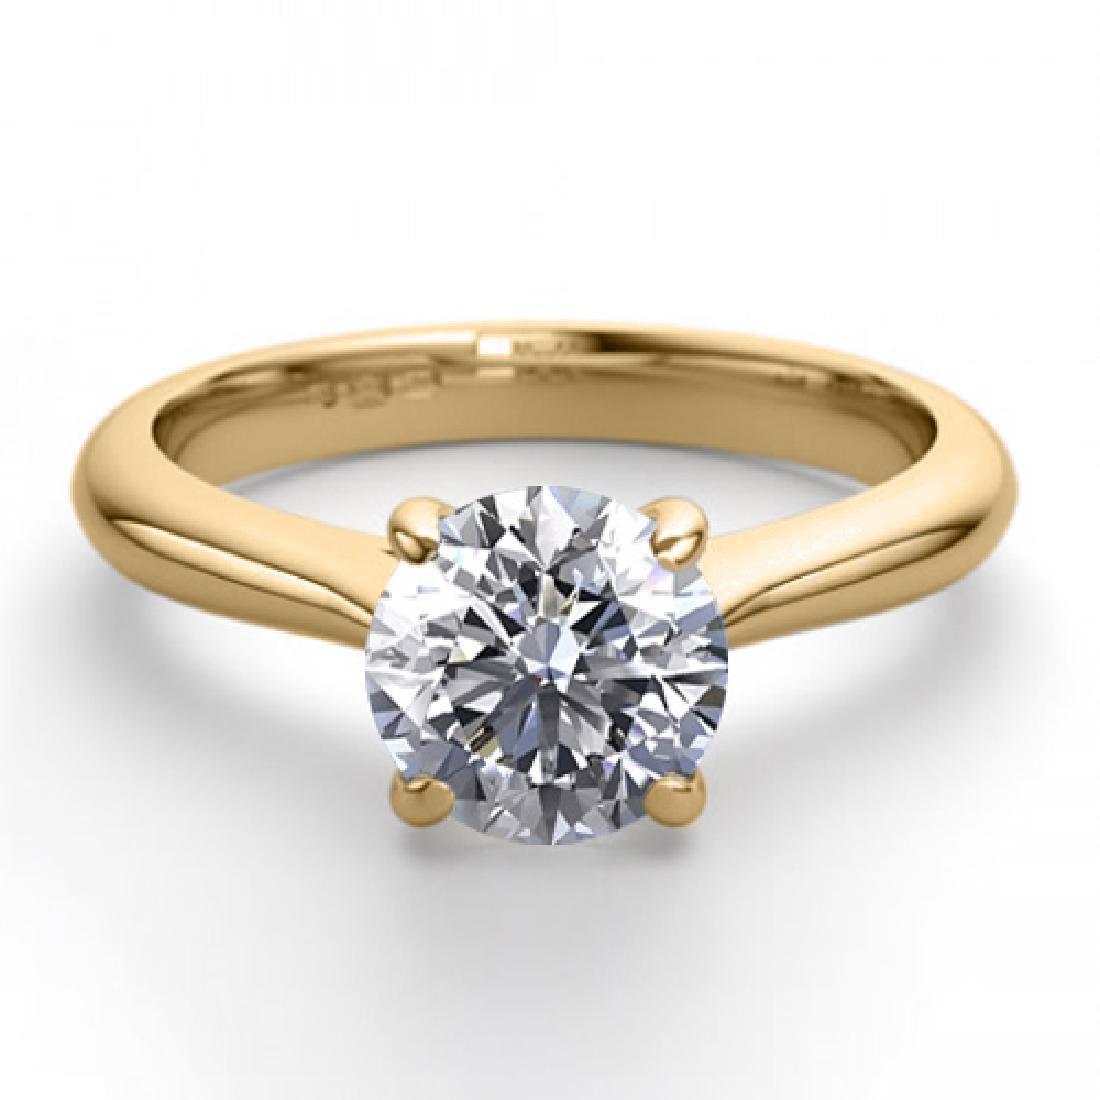 14K Yellow Gold Jewelry 1.52 ctw Natural Diamond